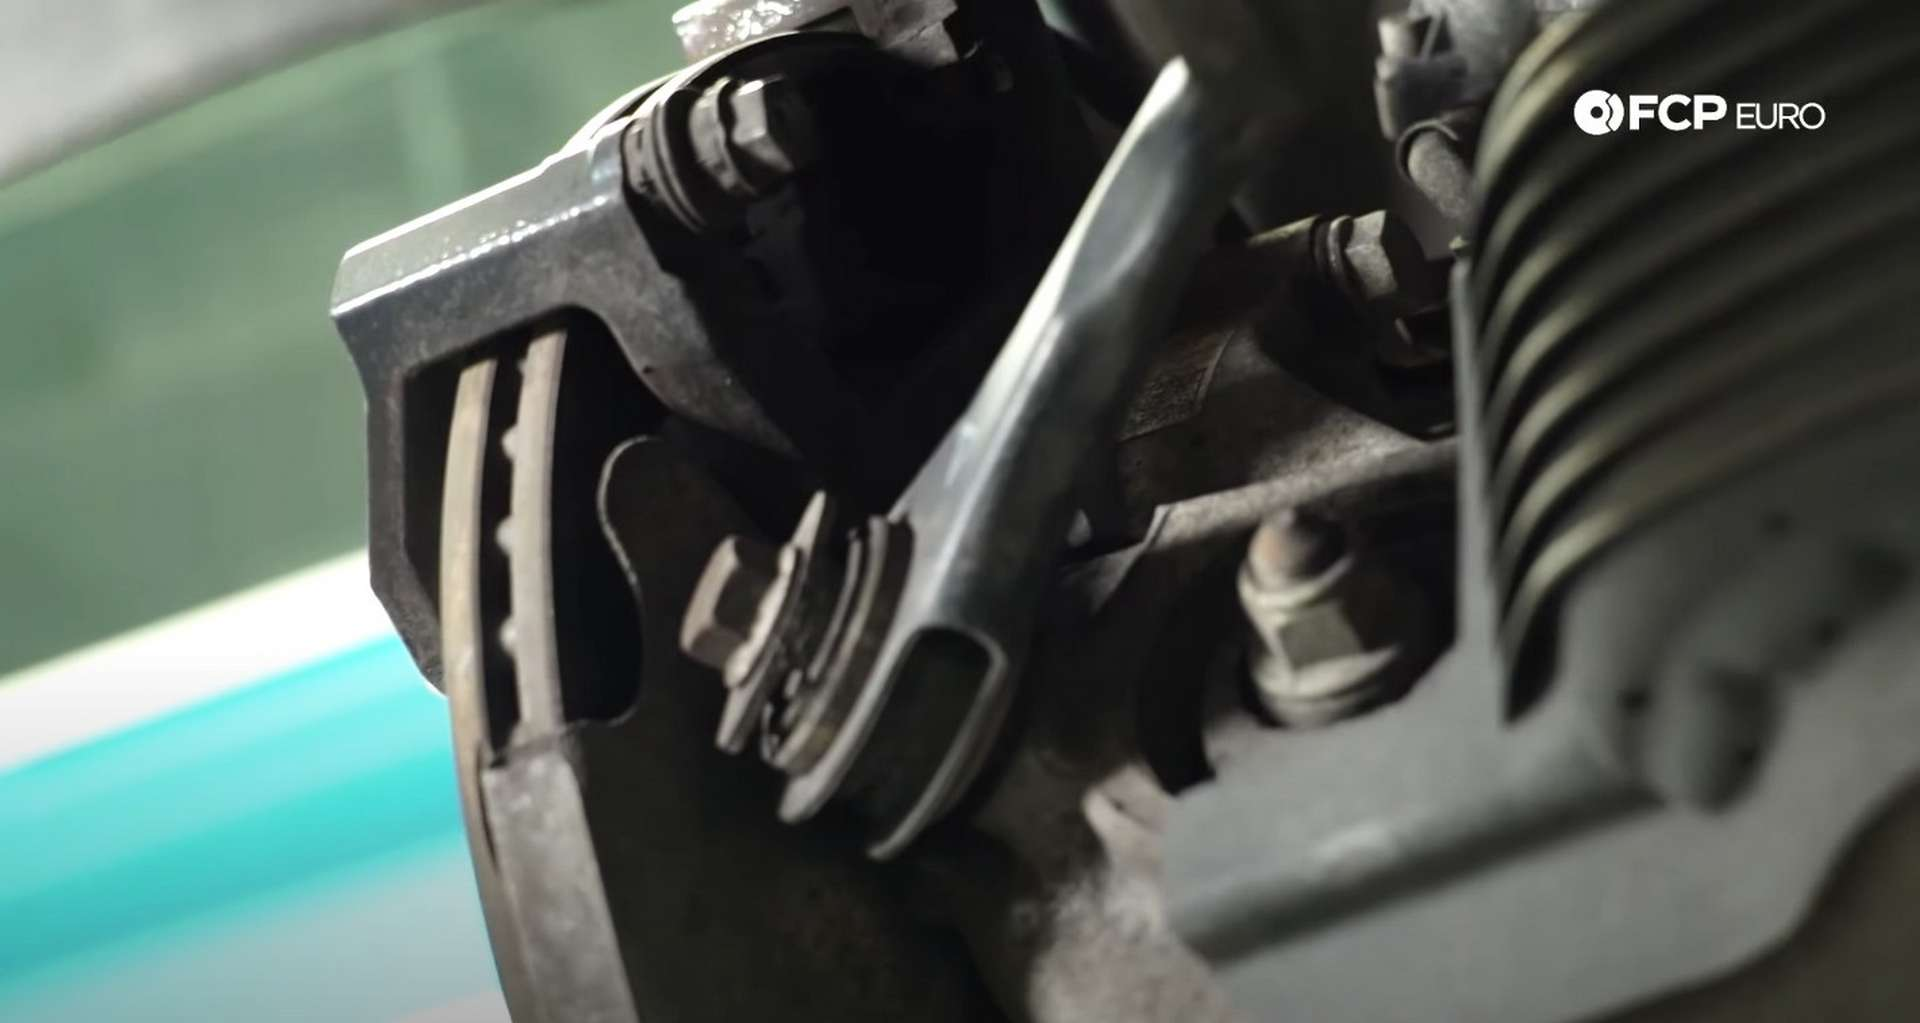 DIY Audi B8 S4 Rear Brake Service caliper bracket bolt location